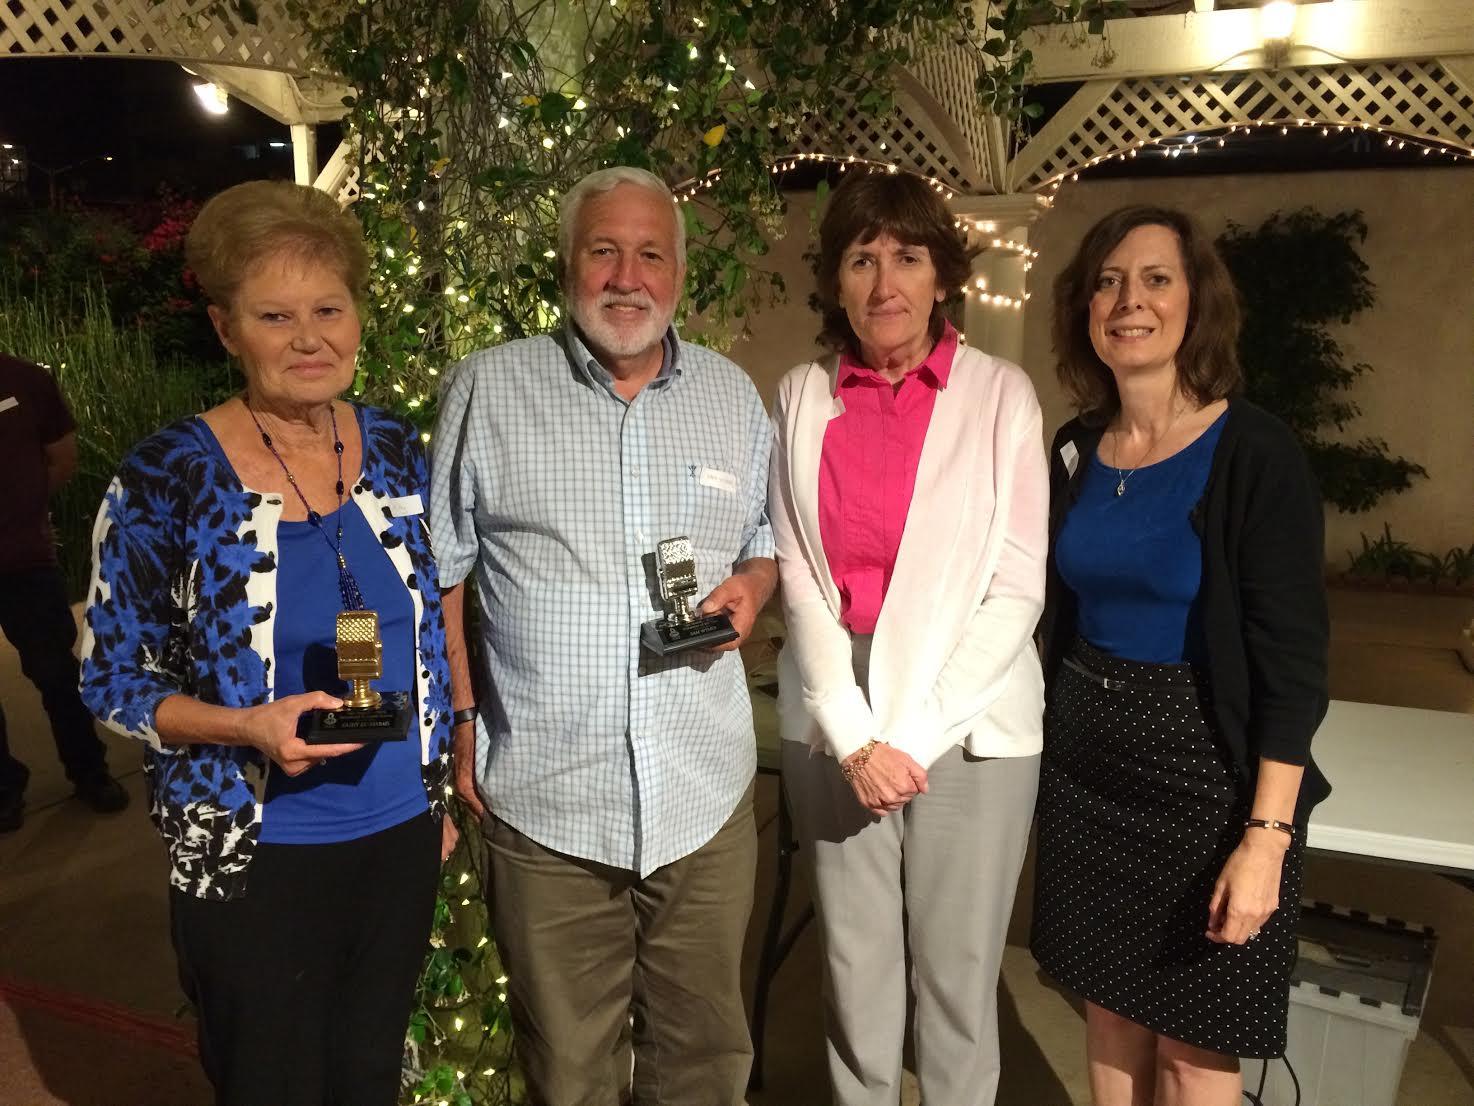 Gold Mic Winner Kathy Desmarais, Silver Mic winner Sam Wymer, Station Manager Mitzi Tharin, DIrector, Andrea Pasquale